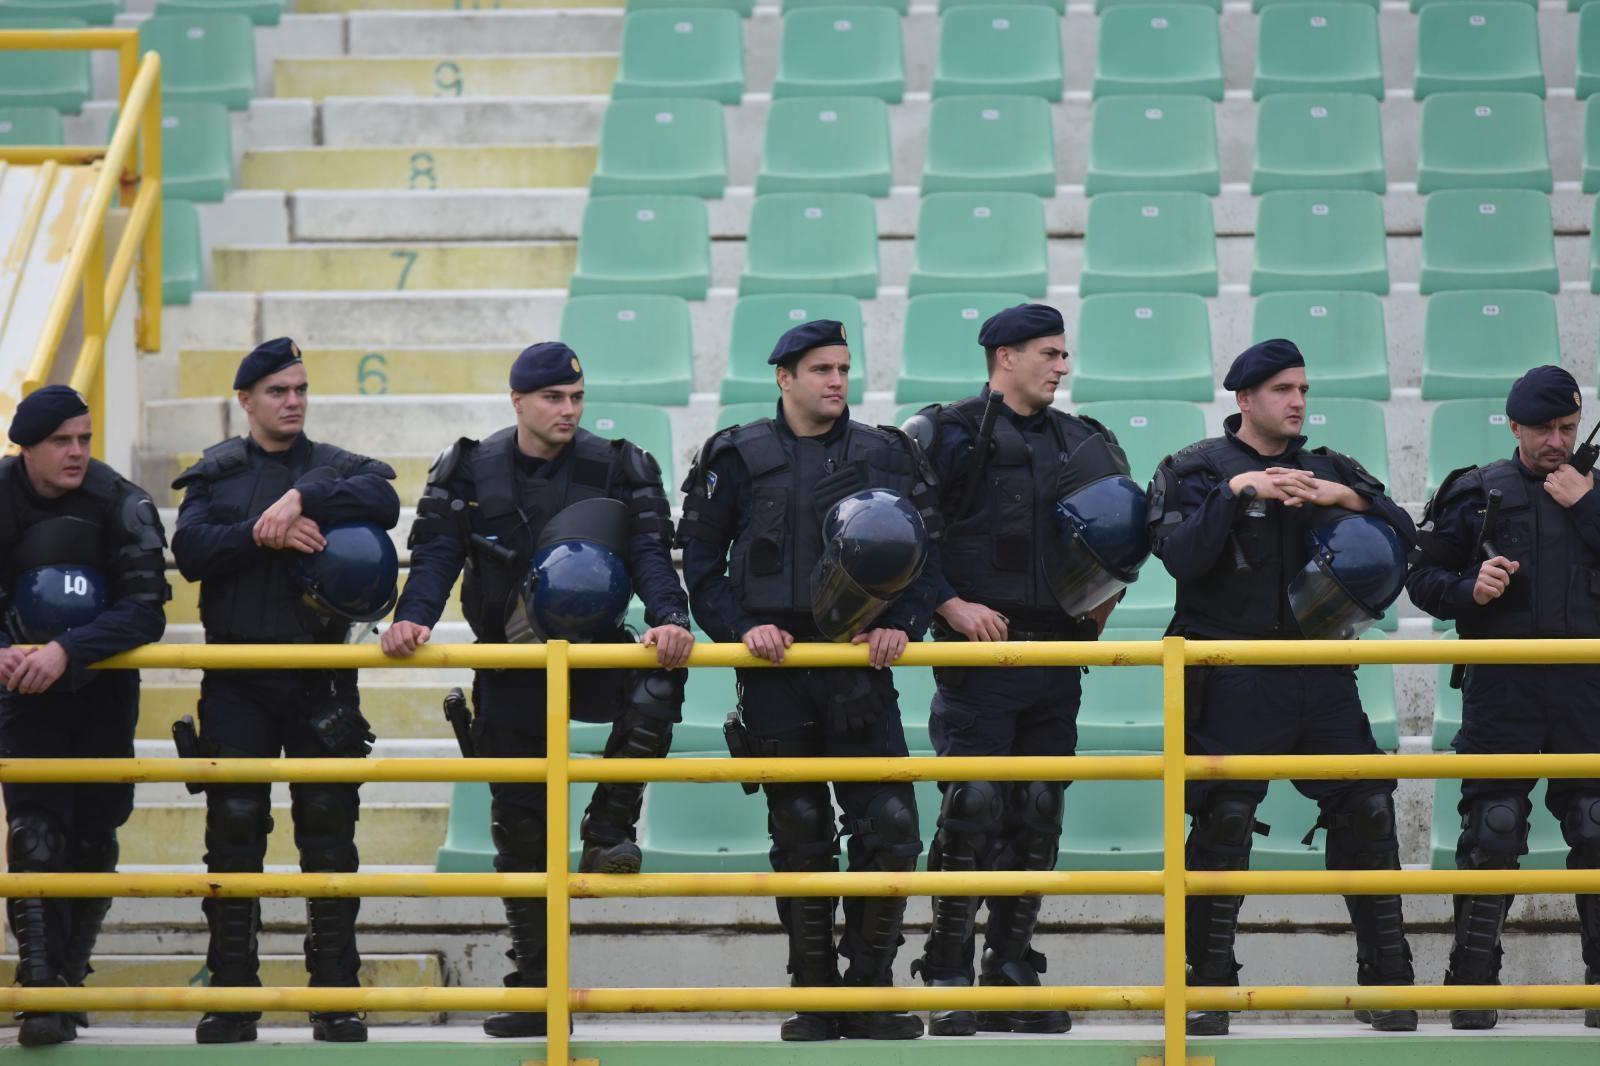 Prije utakmice Dinamo- Hajduk privedeno 20 osoba